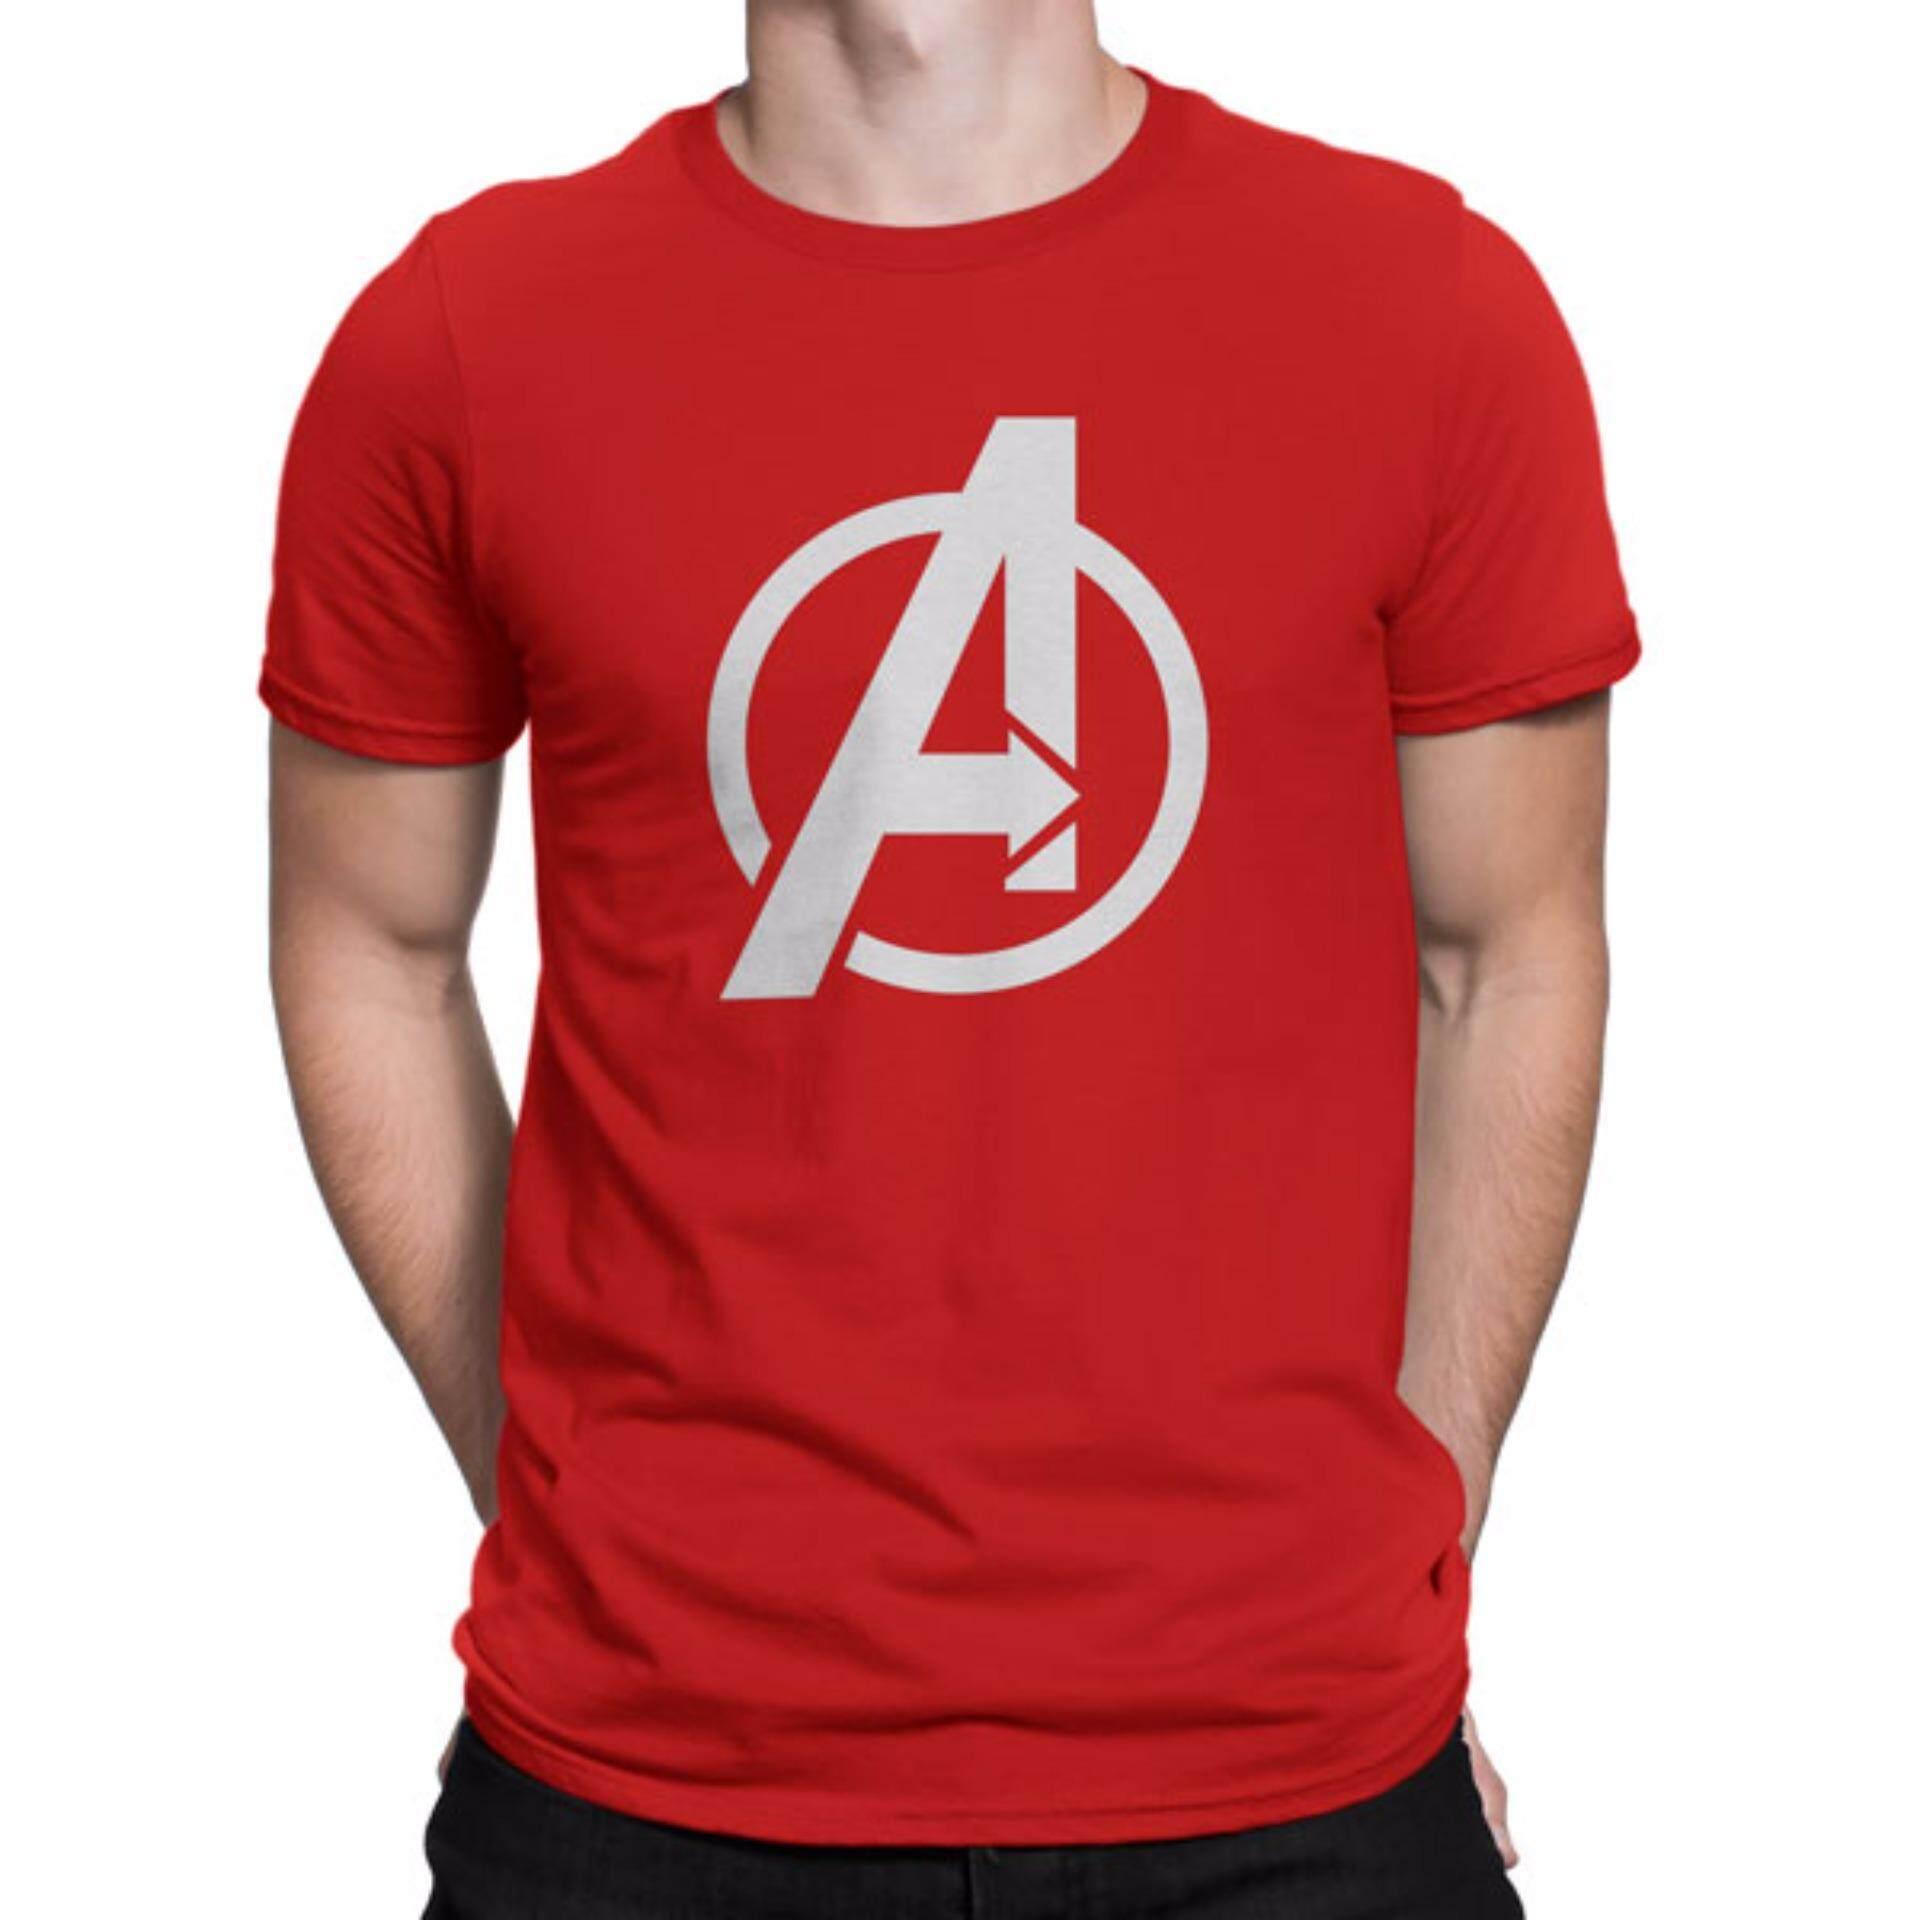 T shirt design red - Marvel Avengers Logo Custom Design Graphic Cotton Mens Red T Shirt Lazada Malaysia